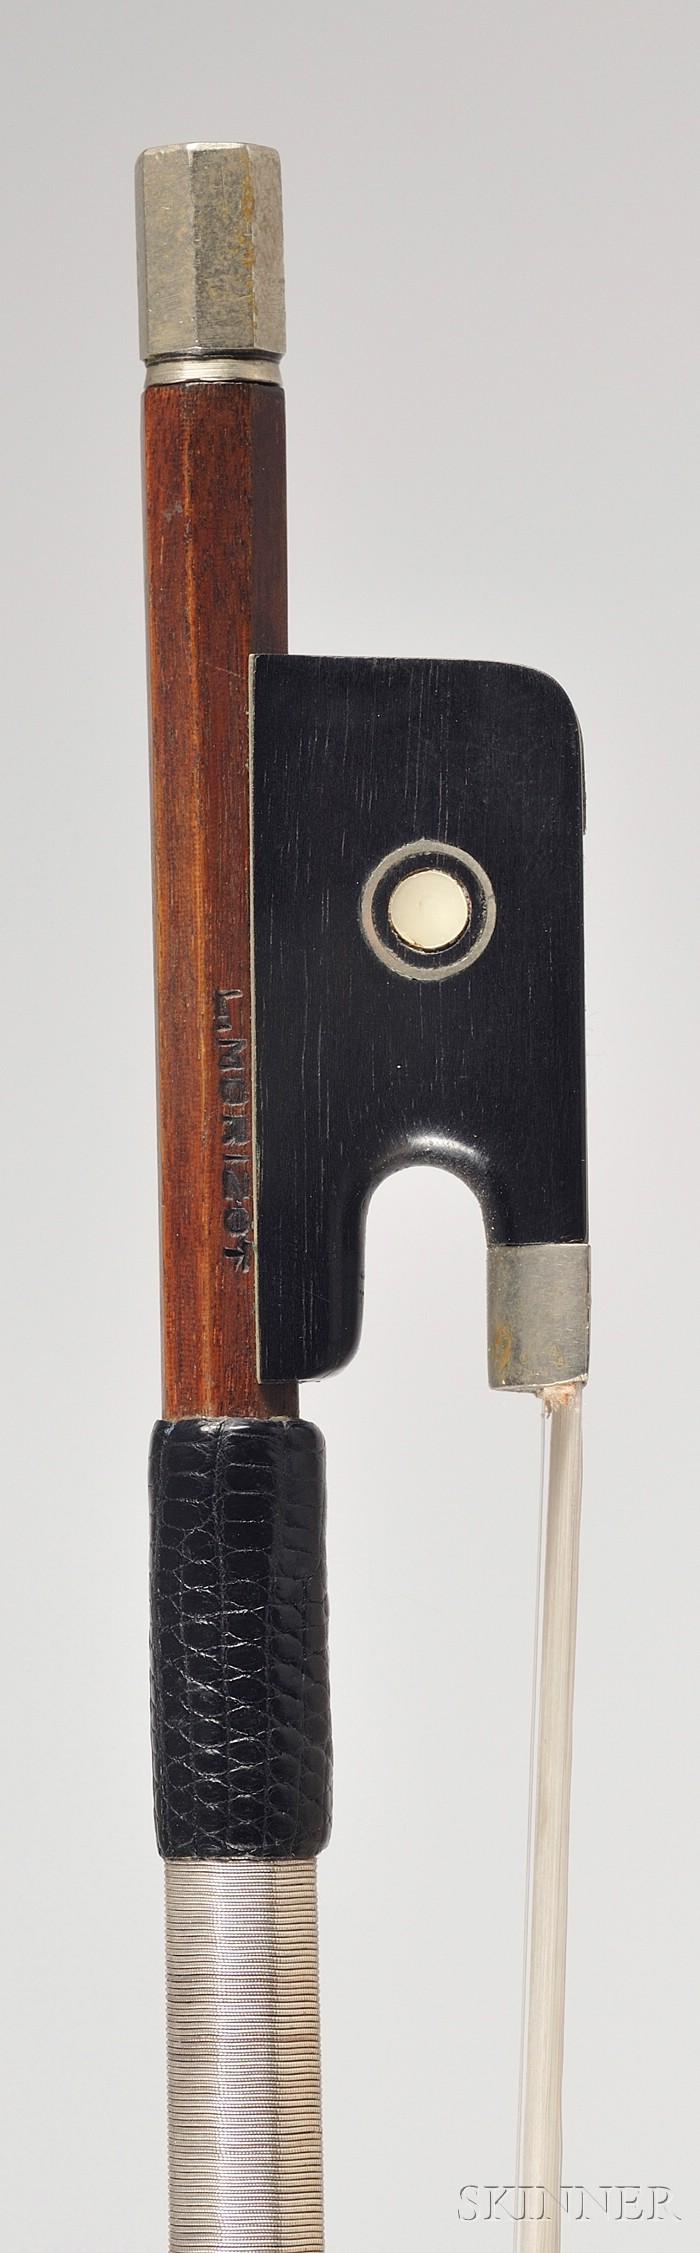 French Nickel Mounted Violin Bow, Morizot Freres